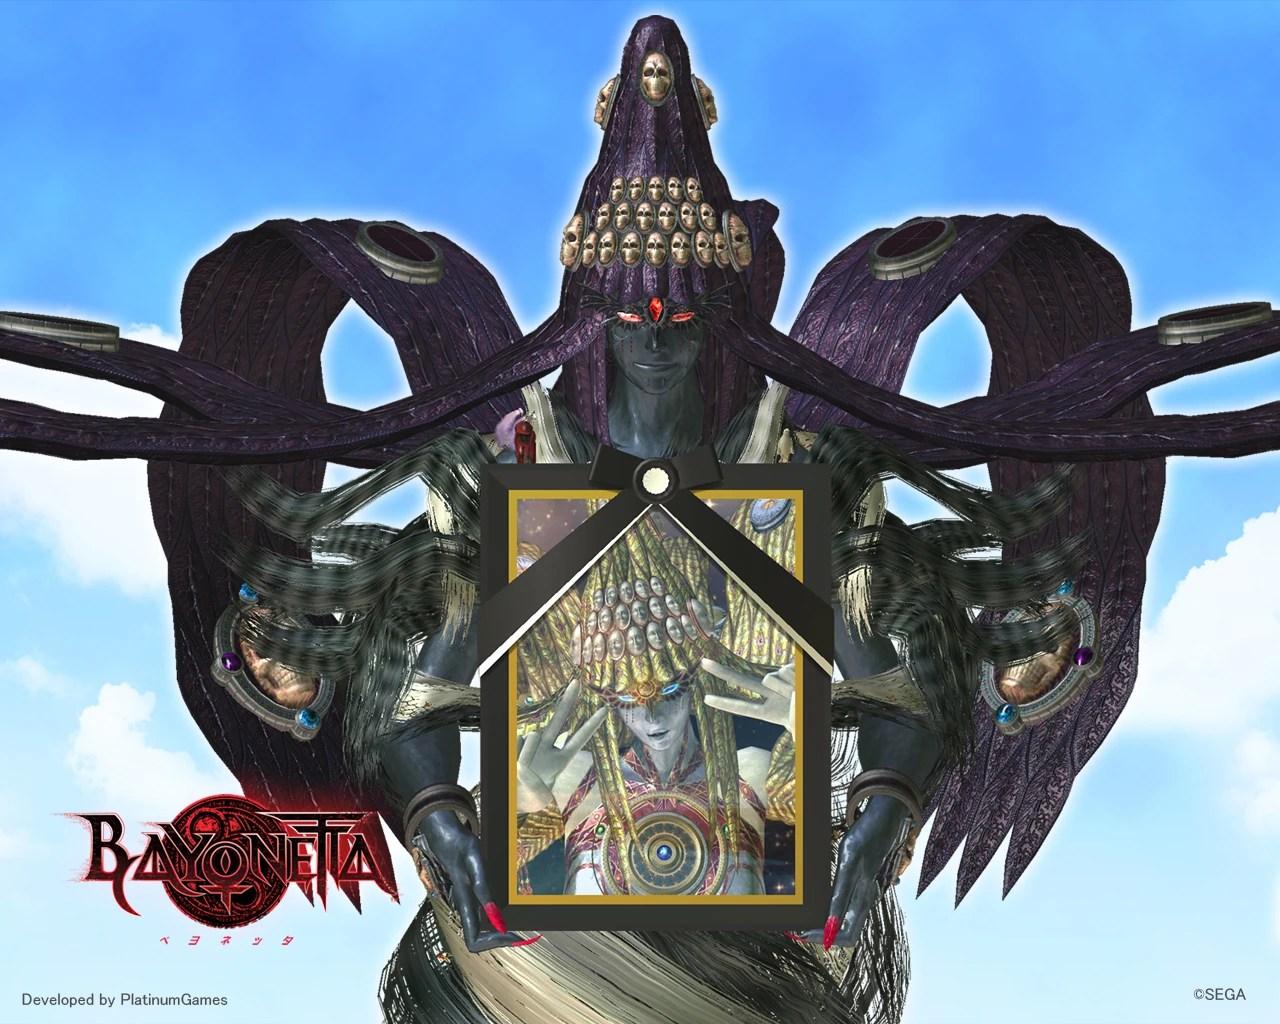 Queen Sheba Bayonetta Wiki Fandom Powered Wikia